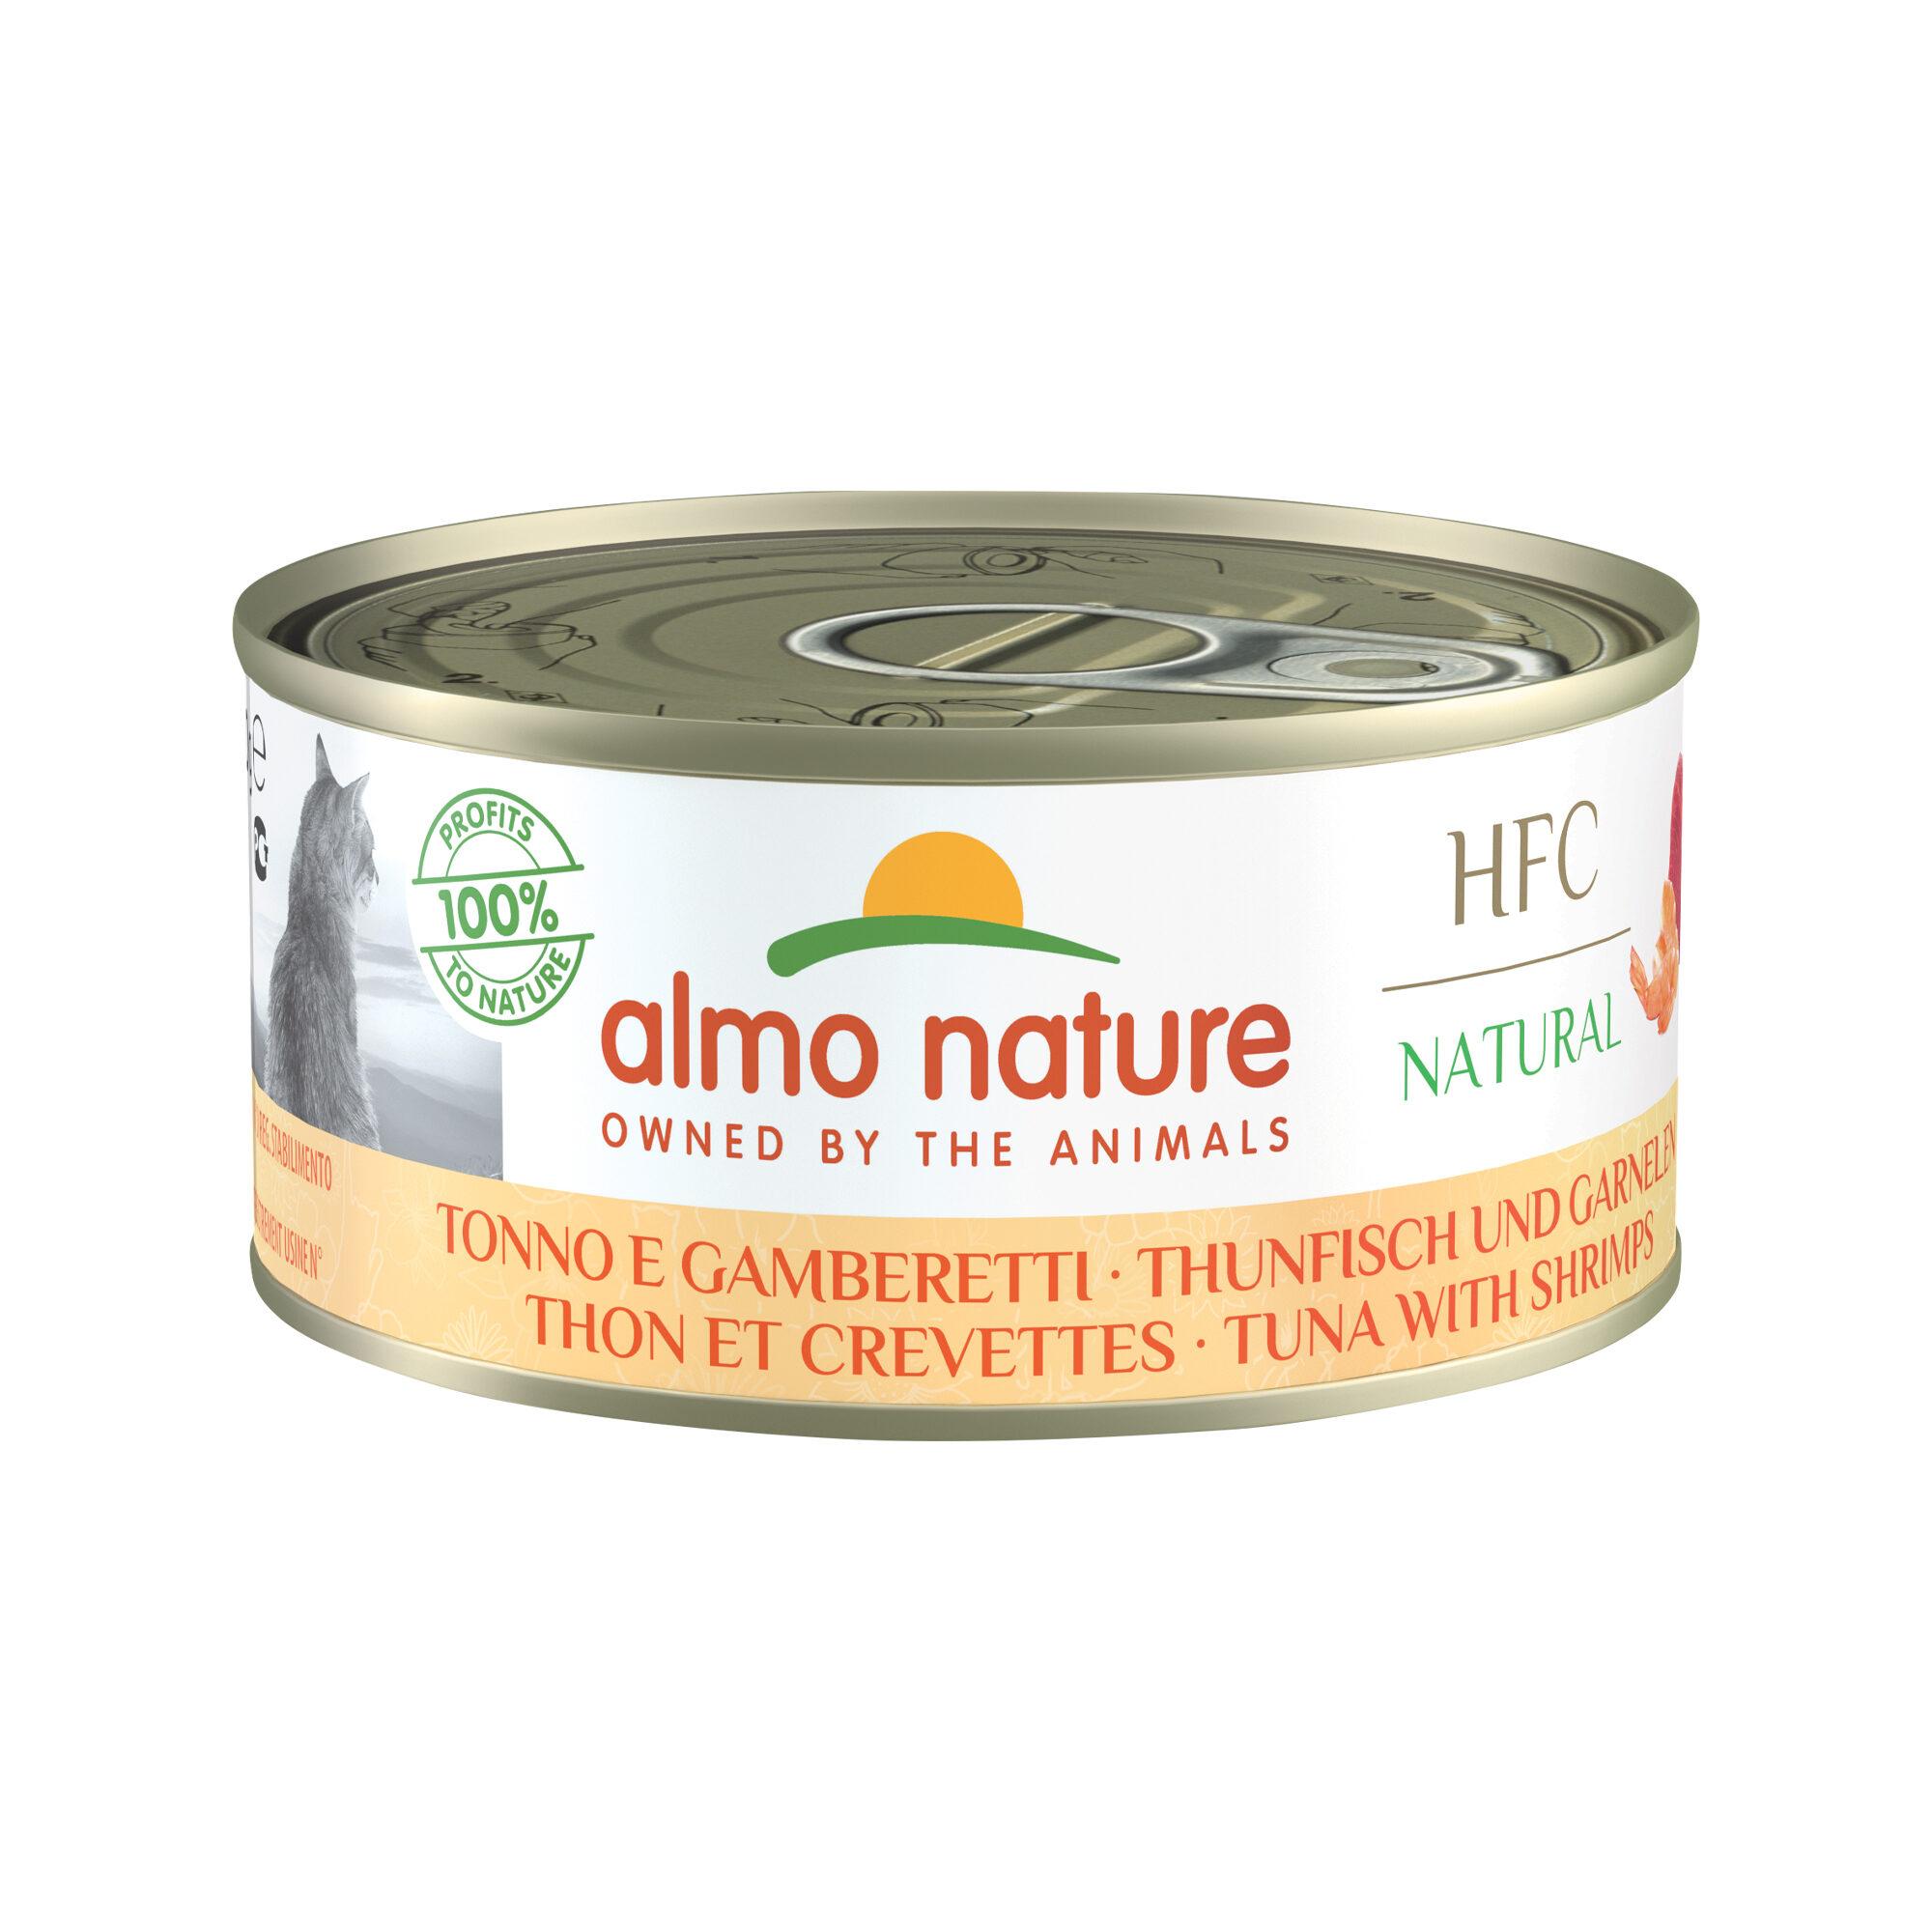 Almo Nature HFC Natural - Thon et crevette